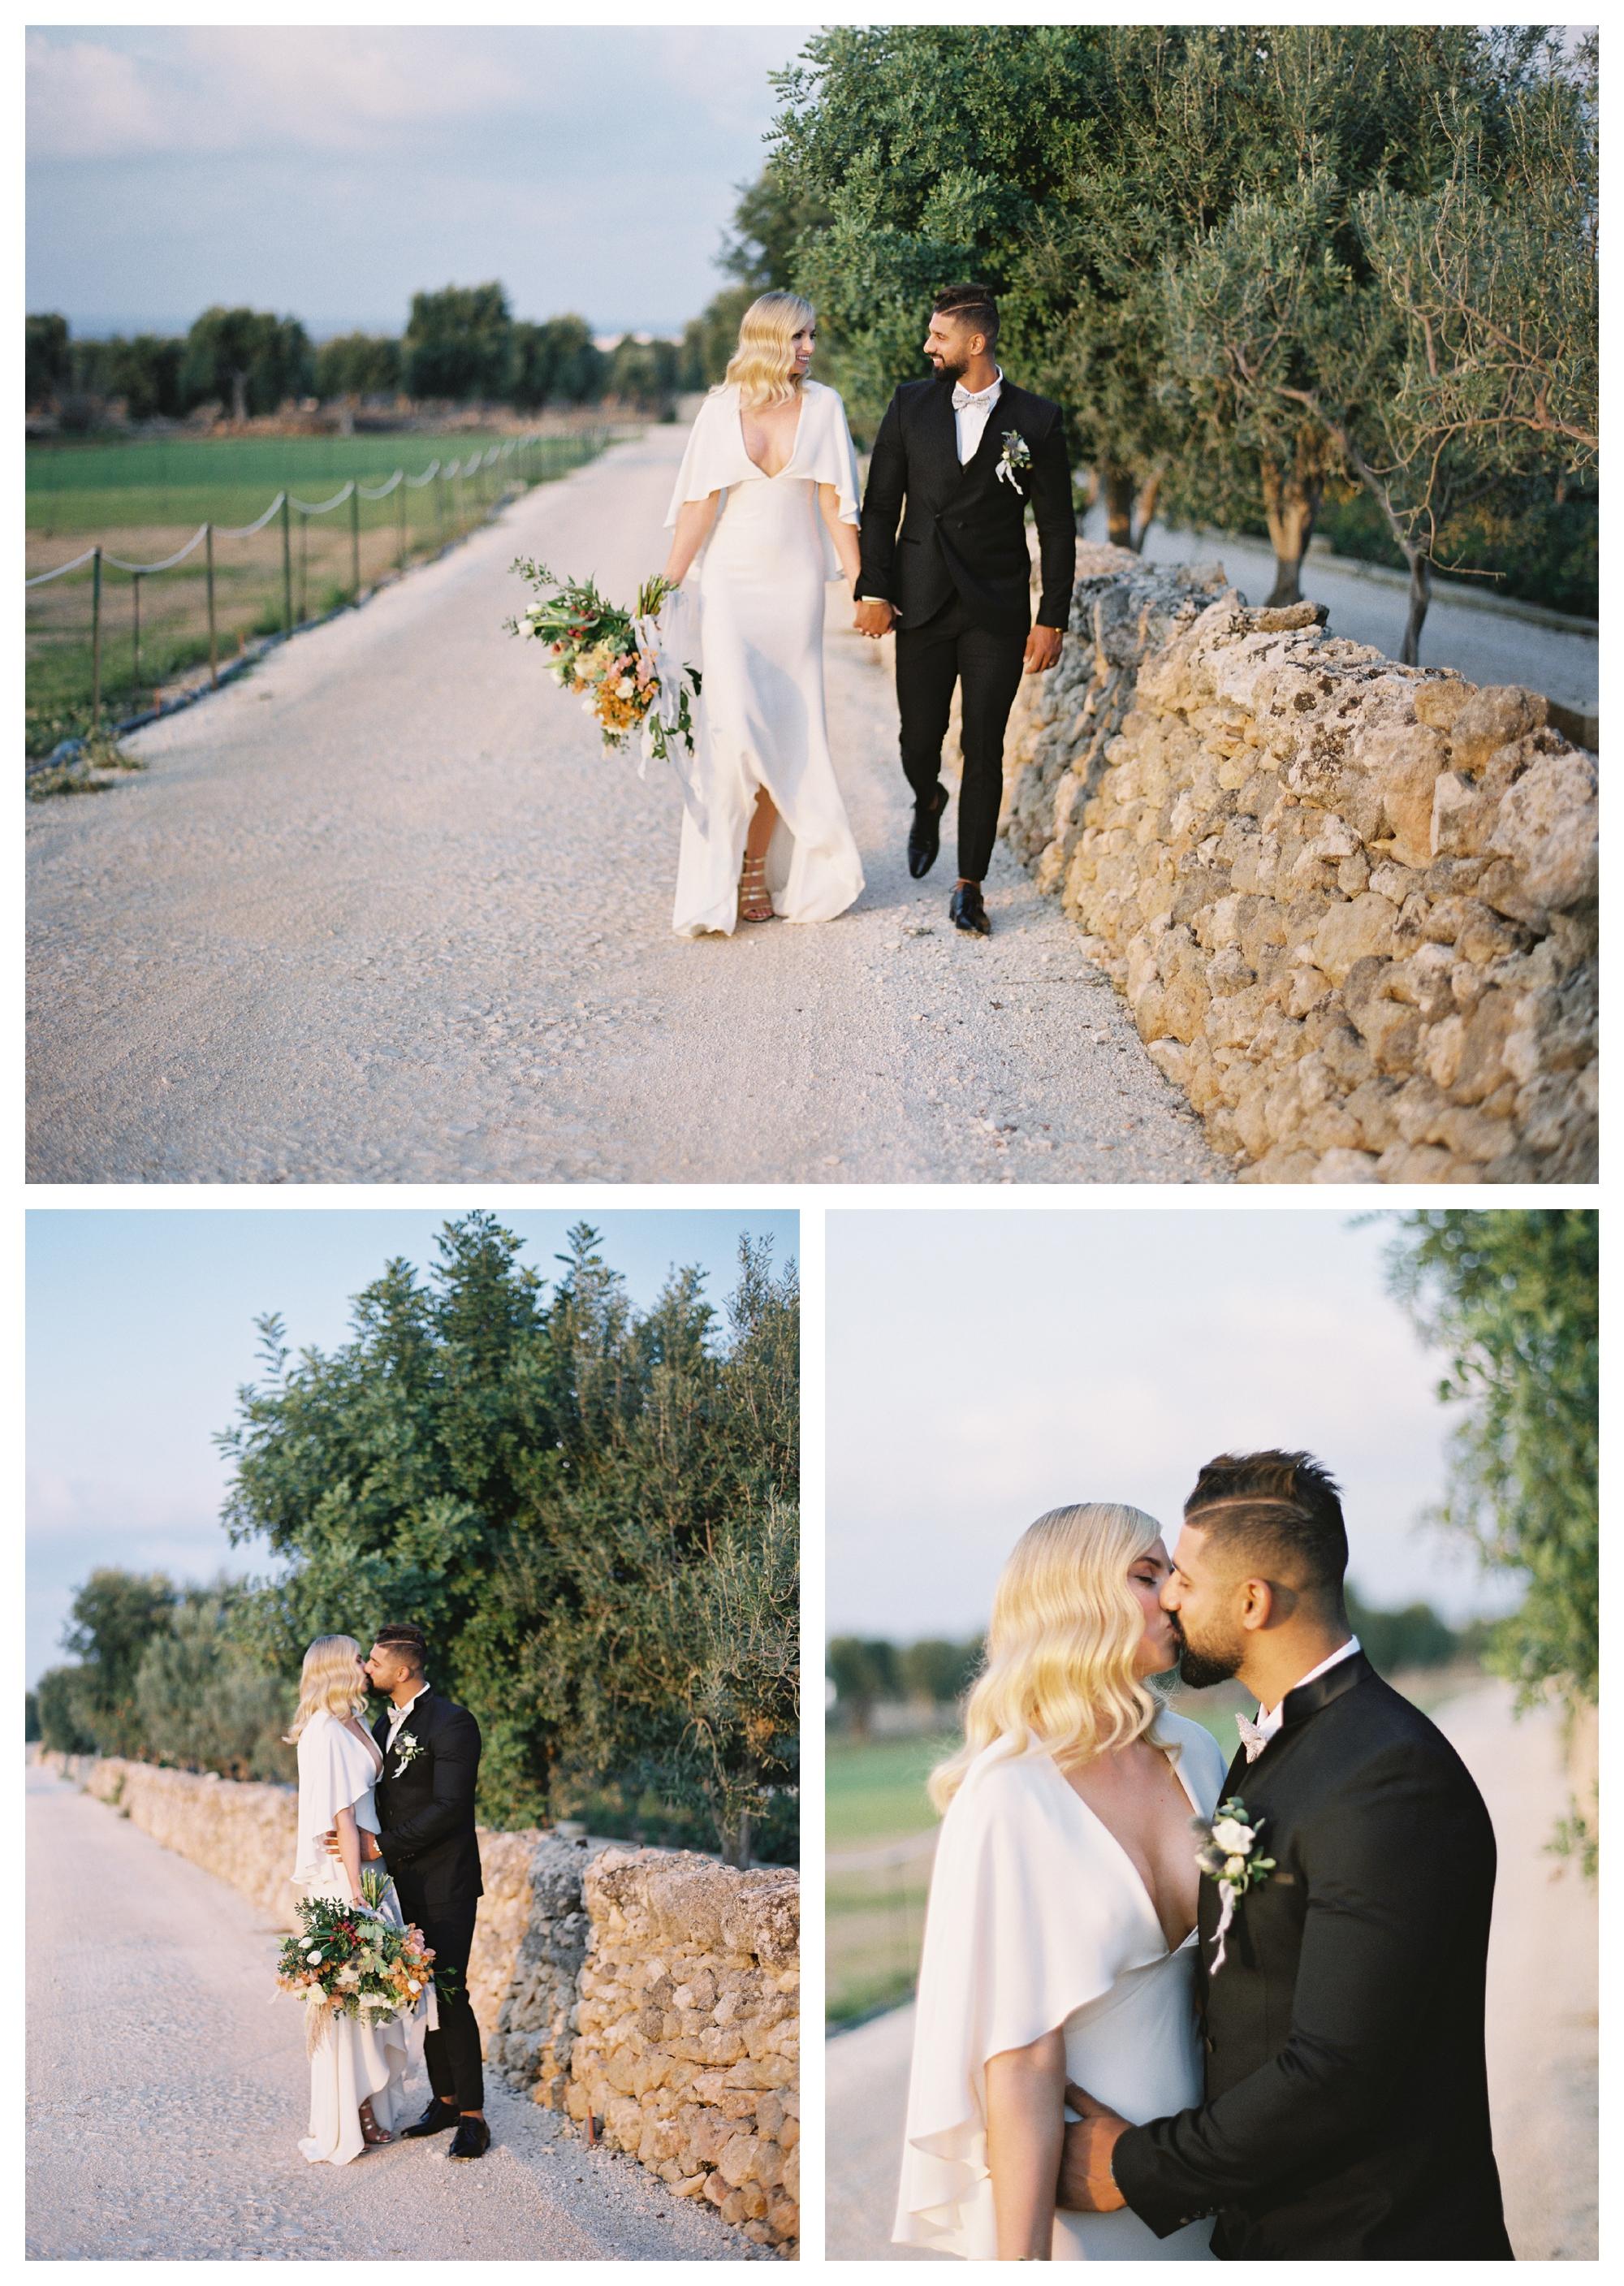 wedding portraits, bride and groom, puglia wedding photos, italy wedding, destination wedding puglia, masseria wedding